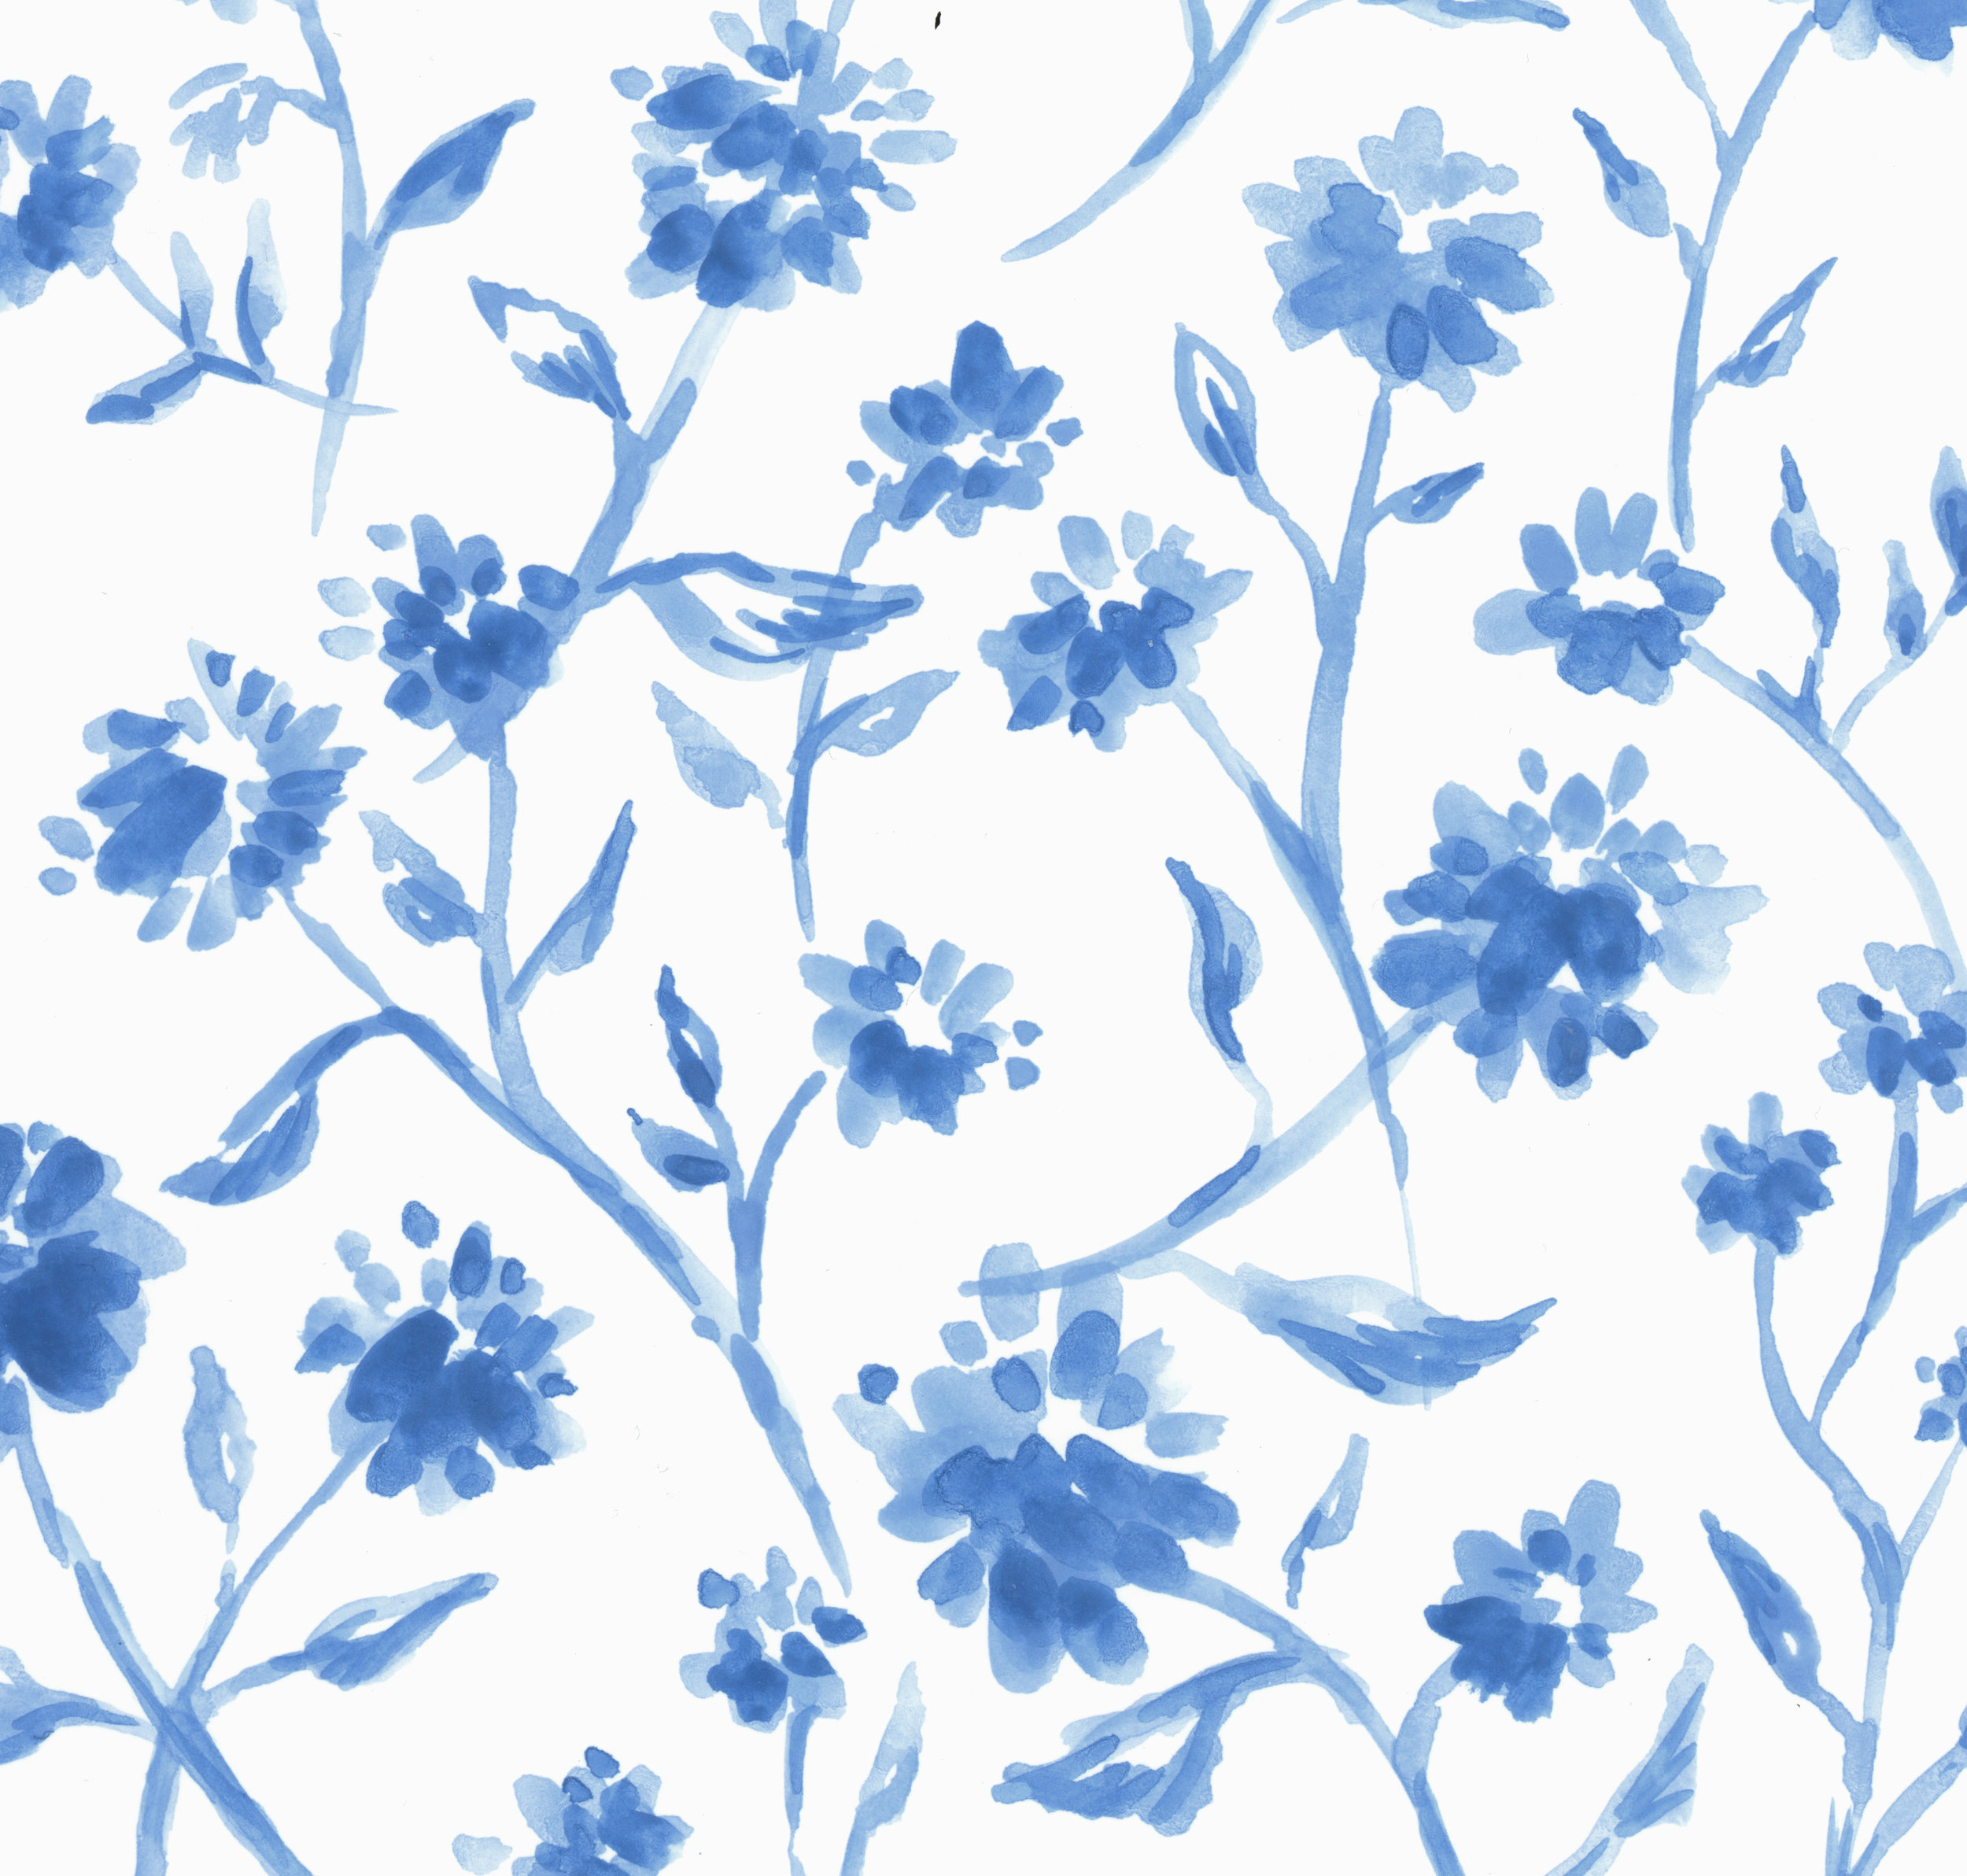 BlueFlowers_KatieDeYoe